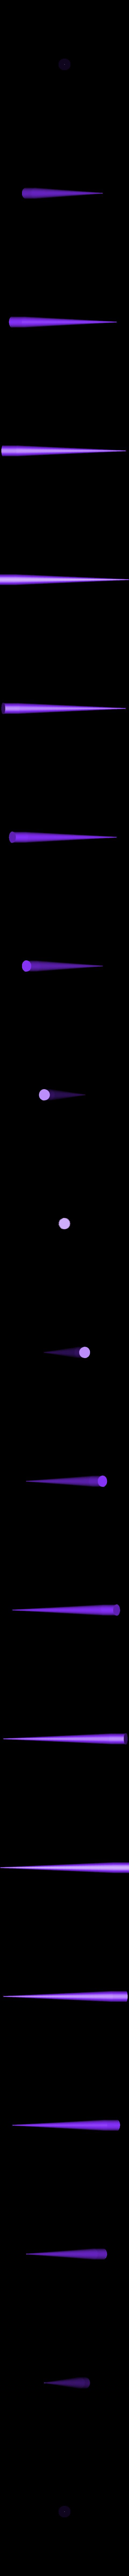 spike.stl Download STL file robocop hand with stand / mano de robocop con stand • 3D printer design, MLBdesign